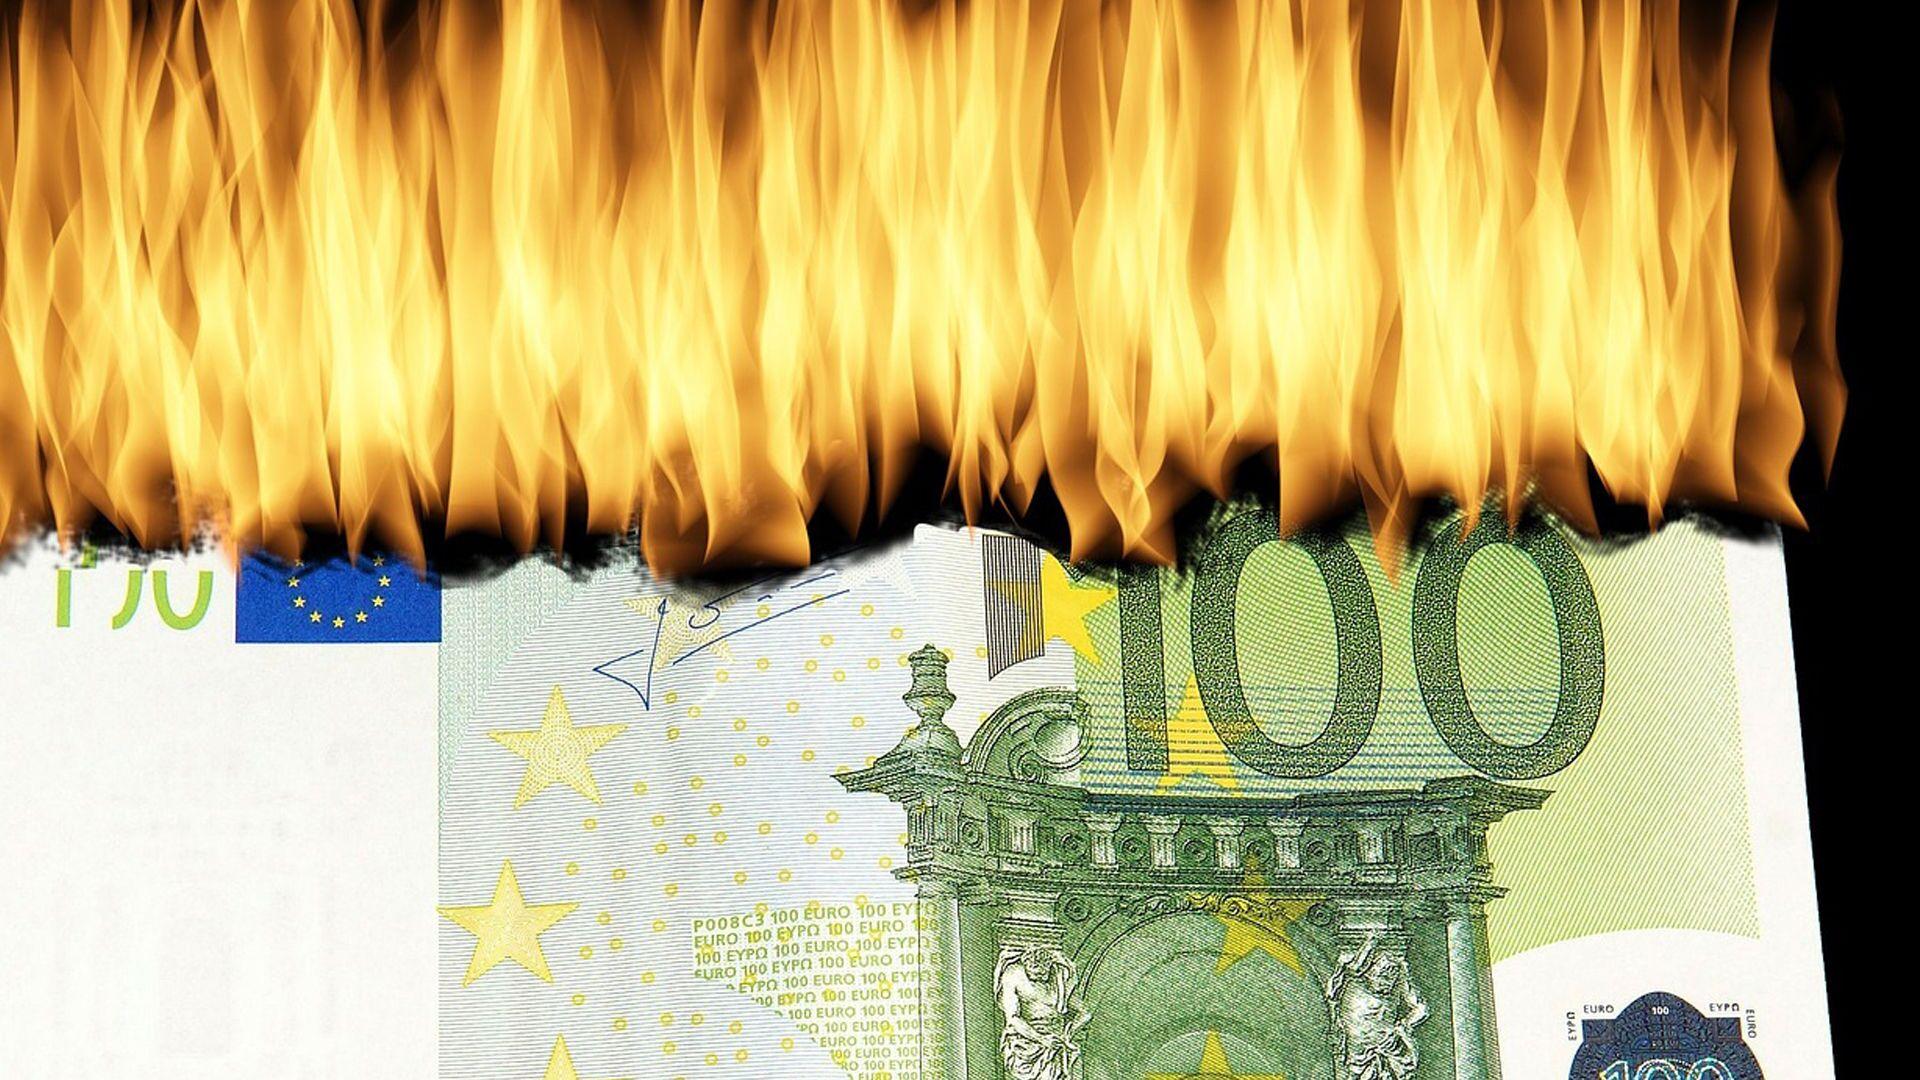 100 euro in fiamme - immagine metaforica - Sputnik Italia, 1920, 04.06.2021